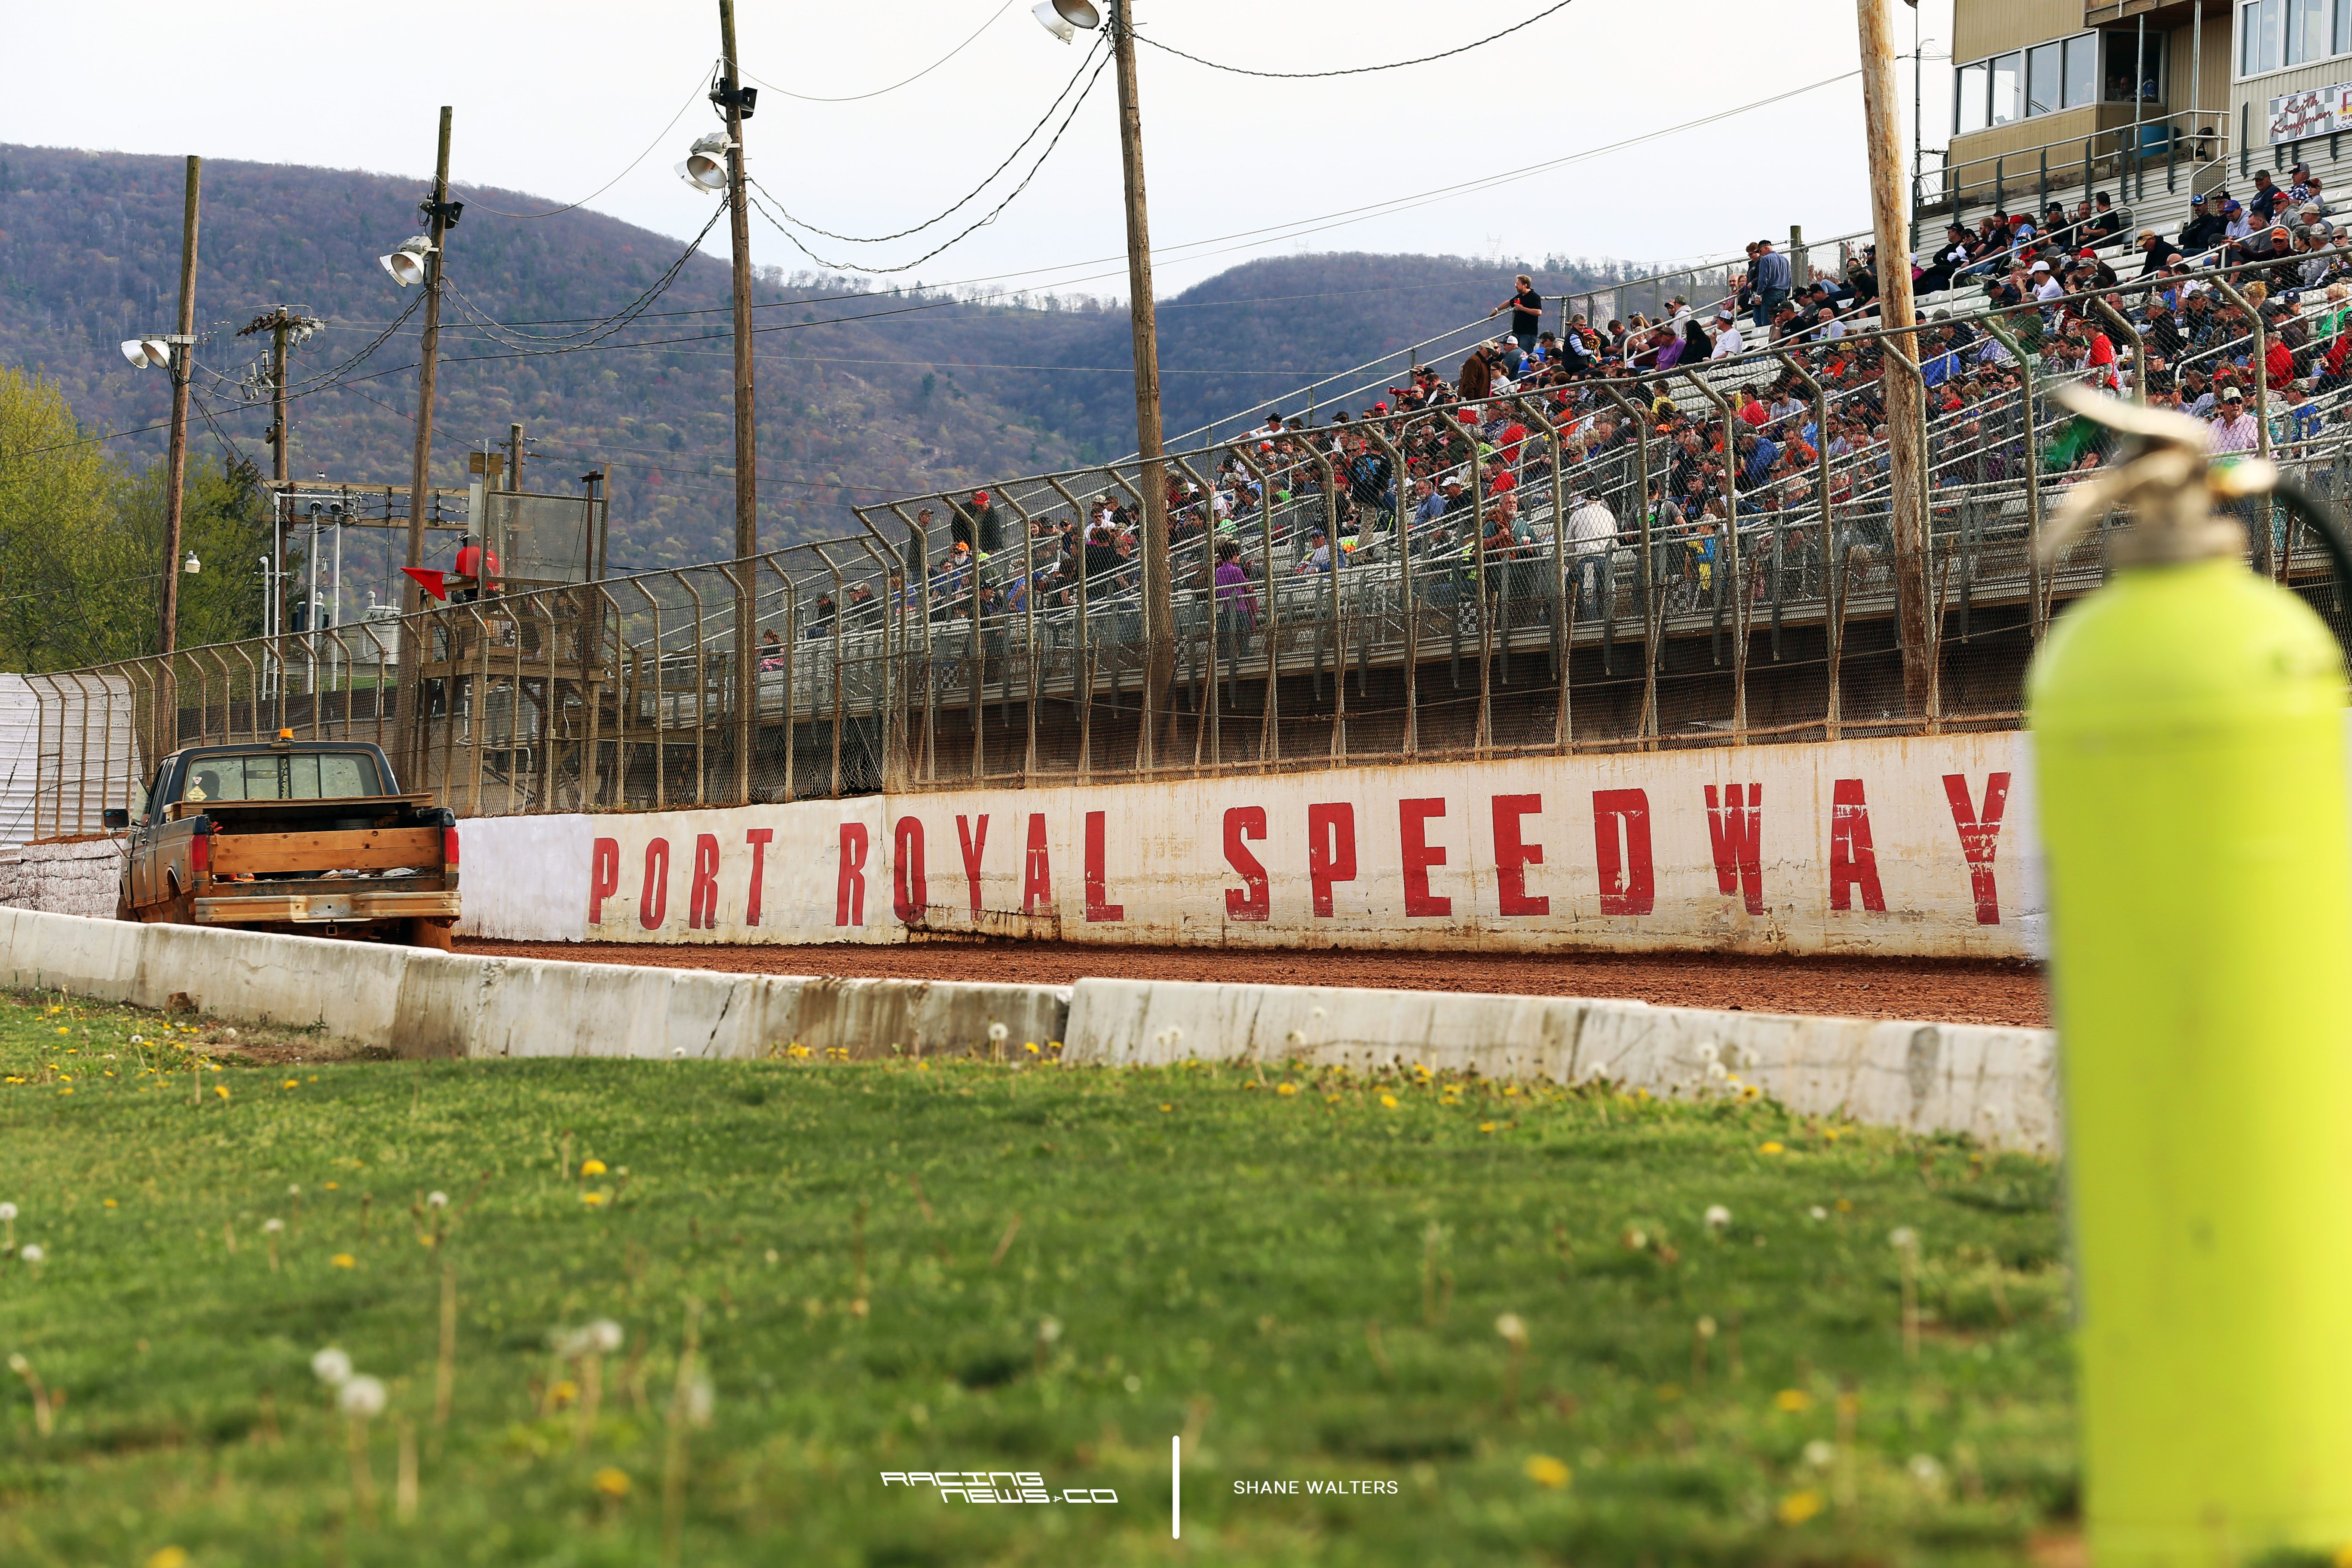 Port Royal Speedway 3505